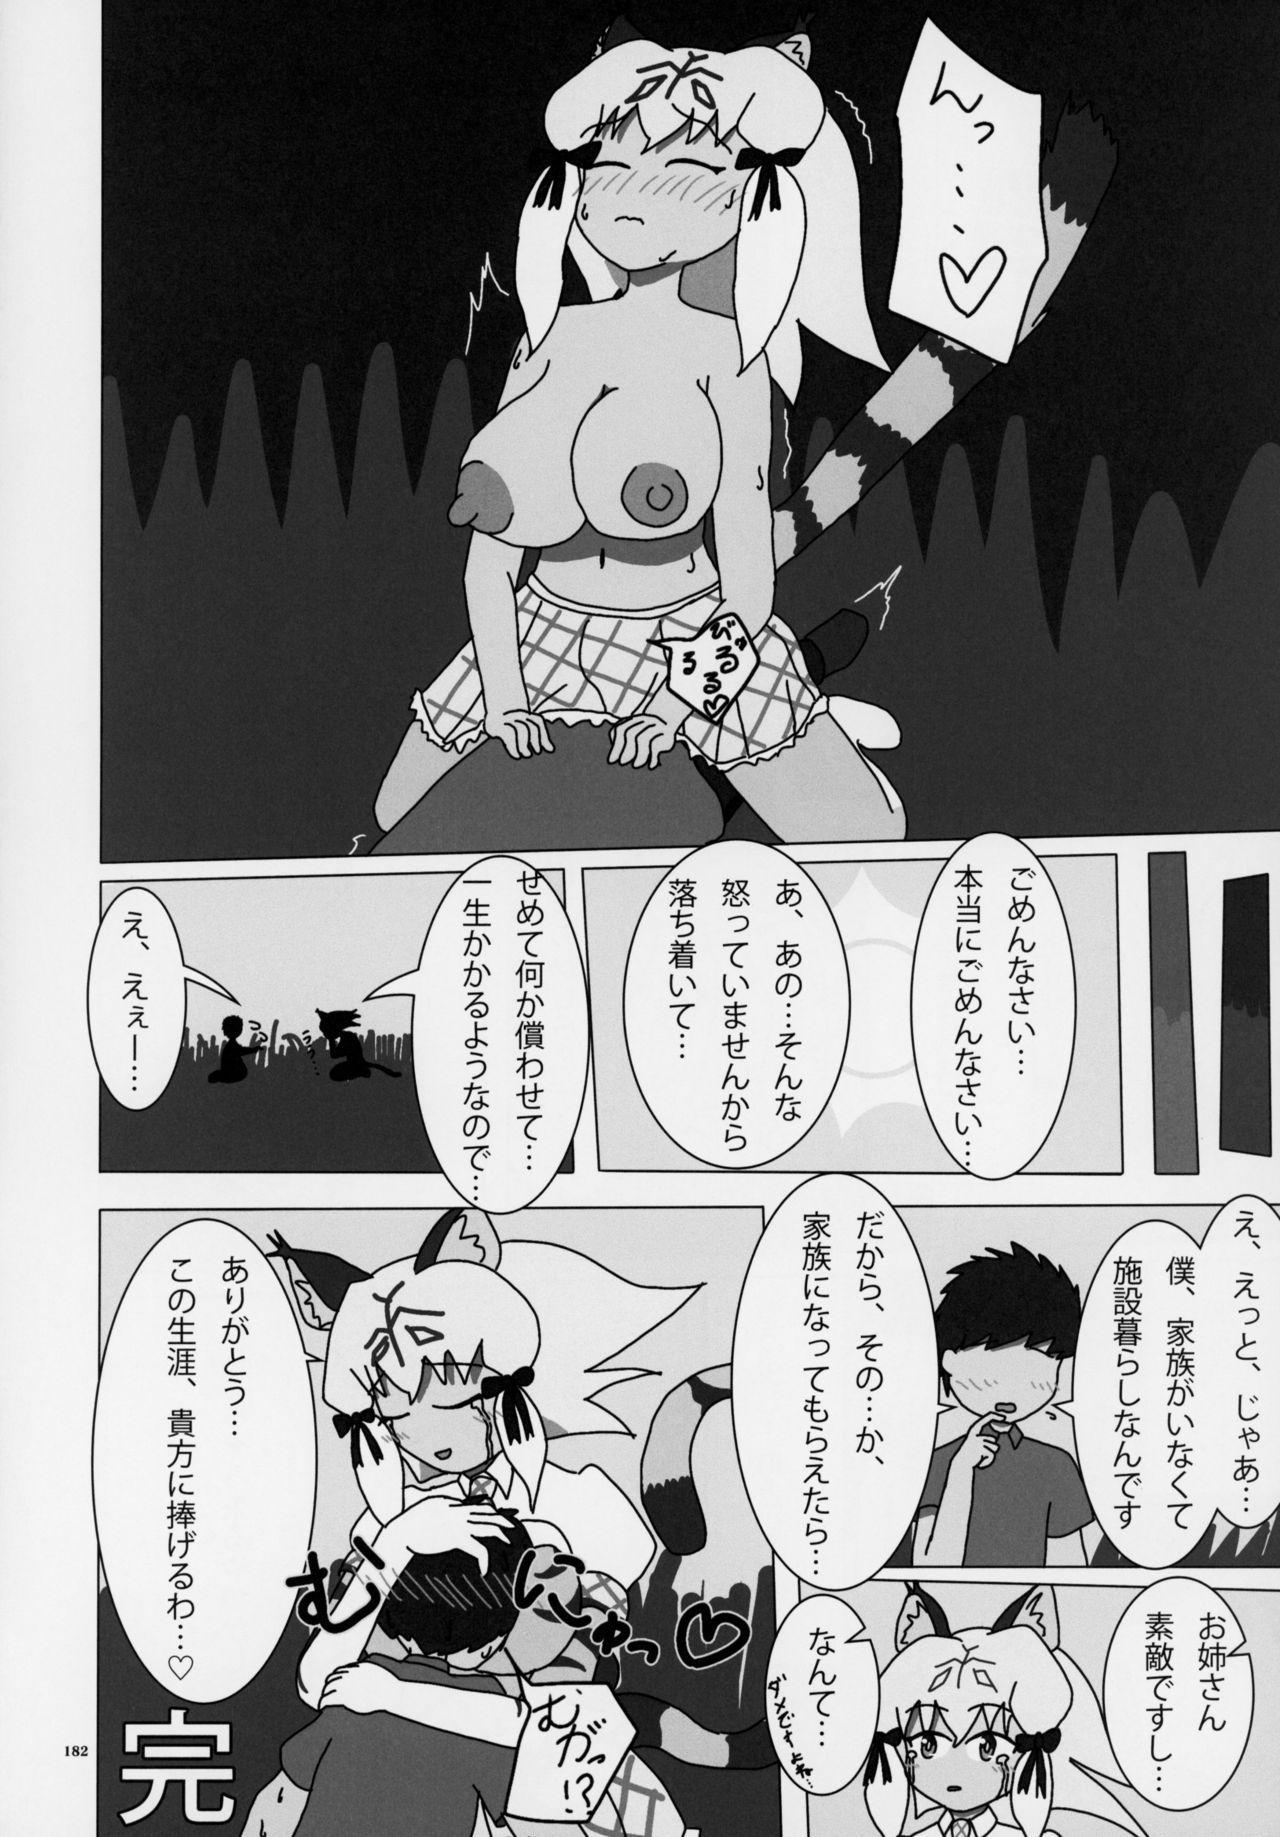 Friends Gyaku Rape Goudoushi 180